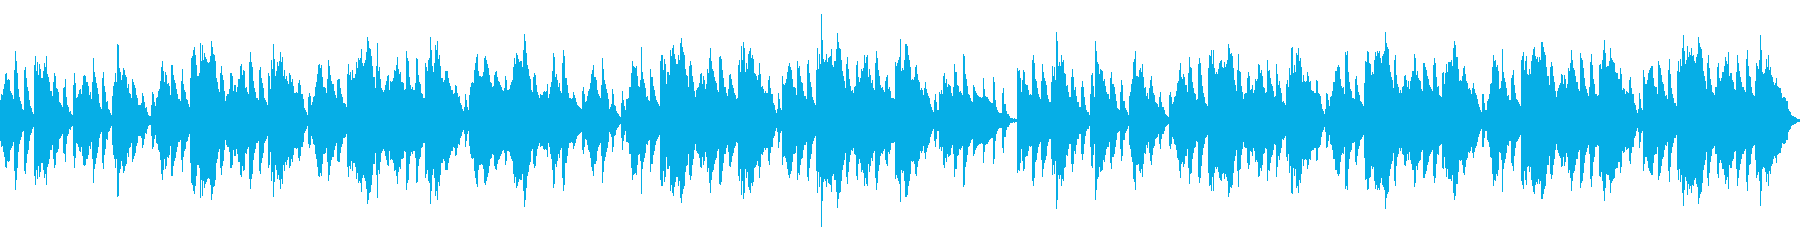 Fushigiの再生済みの波形